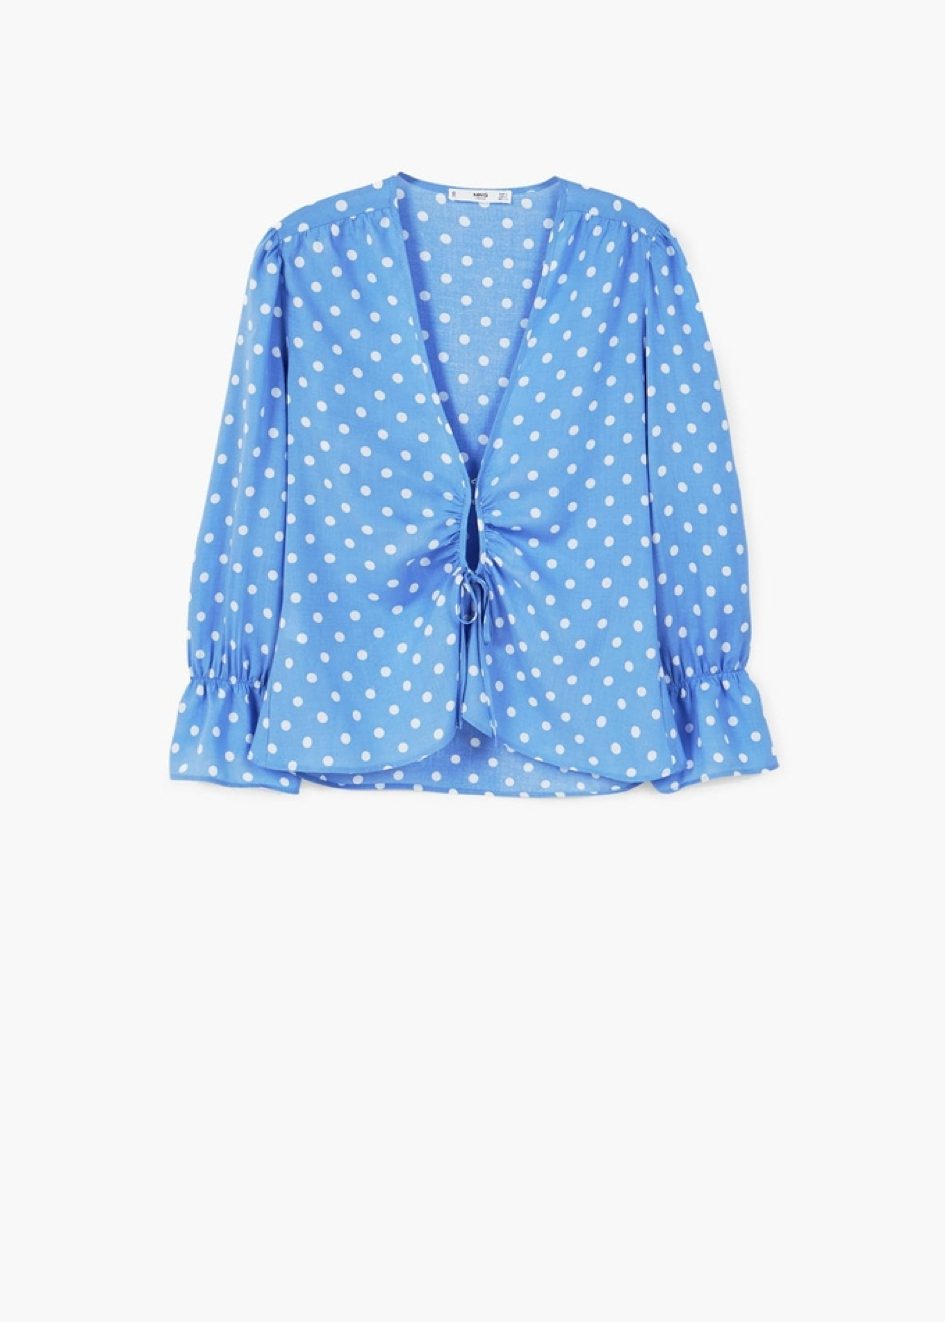 polka dot outfits 4